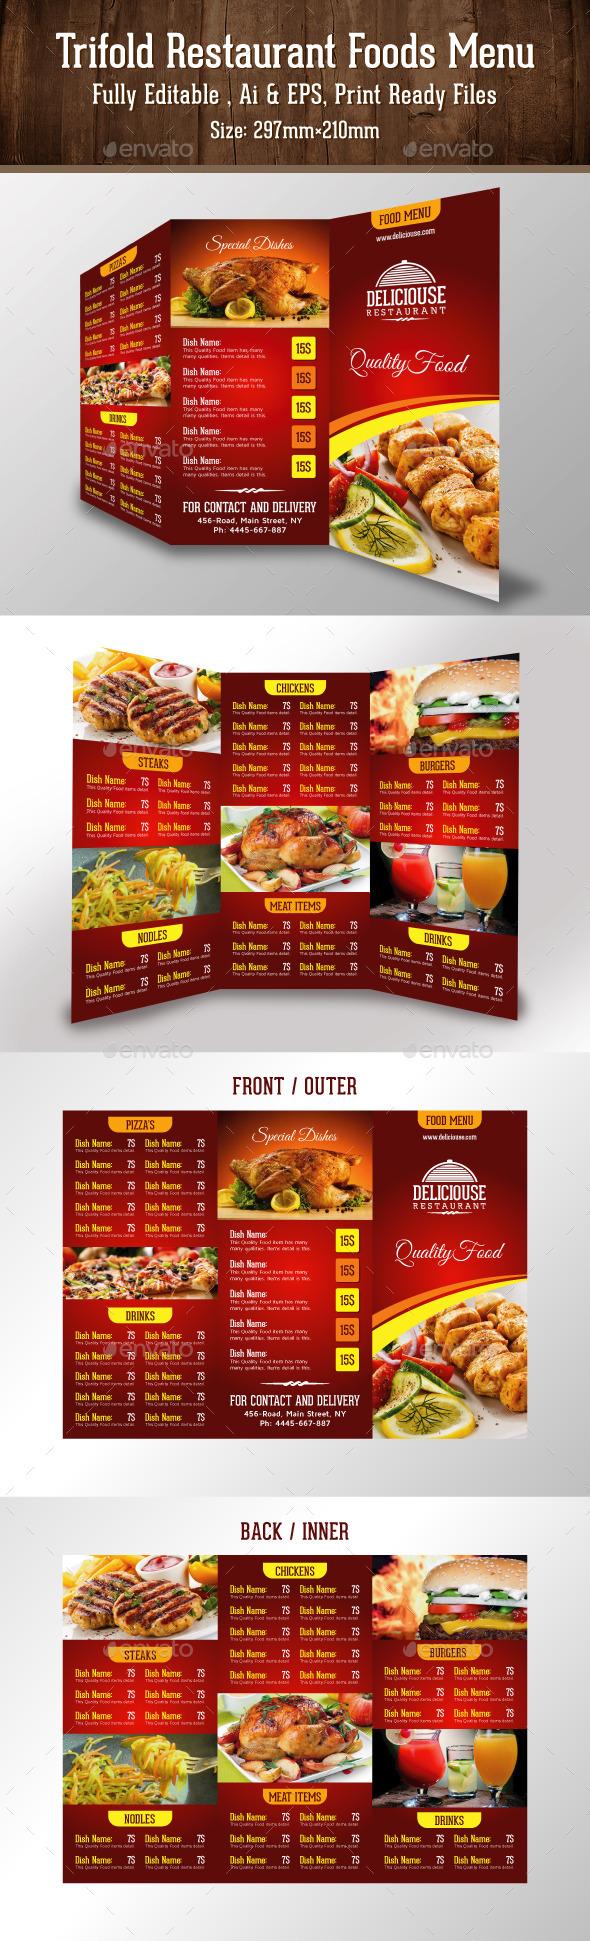 Trifold Restaurant Foods Menu